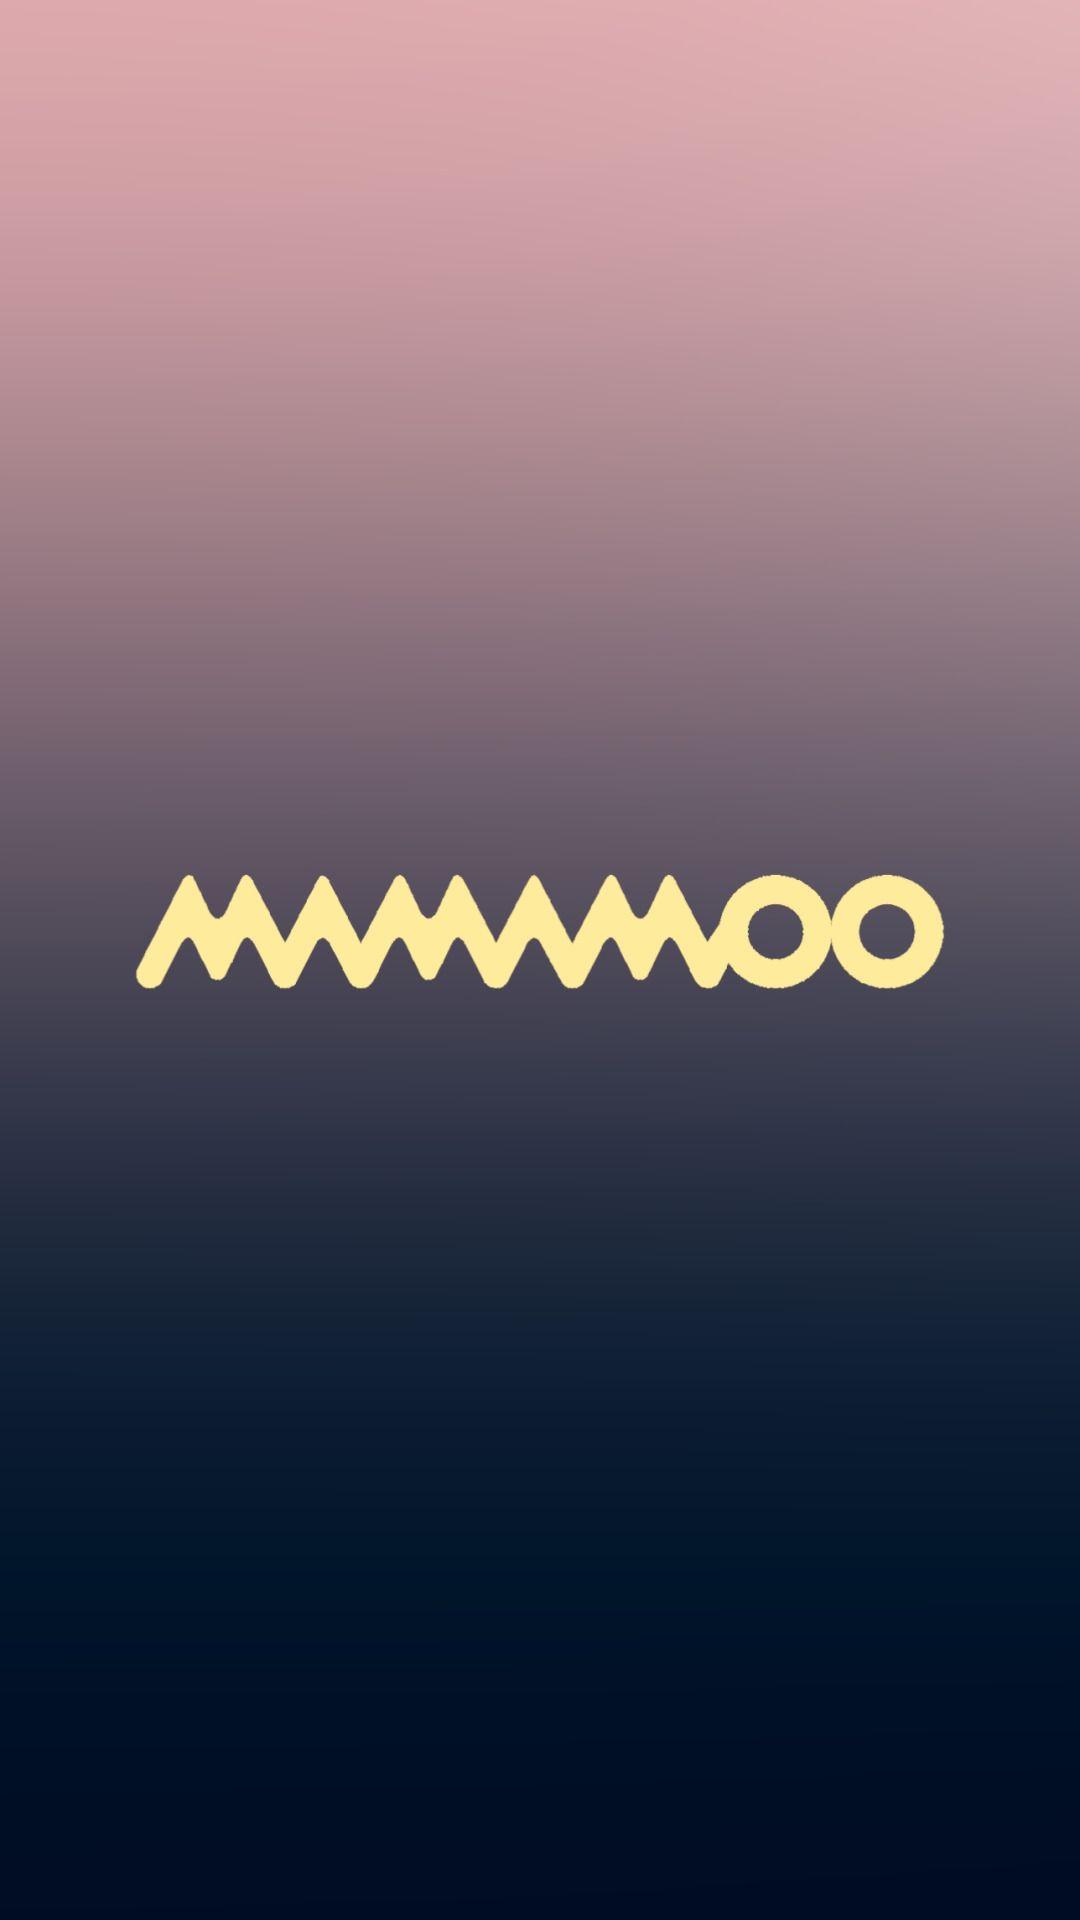 ʟᴇᴛs ғᴏʀɢᴇᴛ ᴡʜᴏ ᴡᴇ ᴀʀᴇ ᴀɴᴅ ᴅɪᴠᴇ ɪɴᴛᴏ ᴛʜᴇ ᴅᴀʀᴋ Kpop Wallpaper Mamamoo Wallpaper